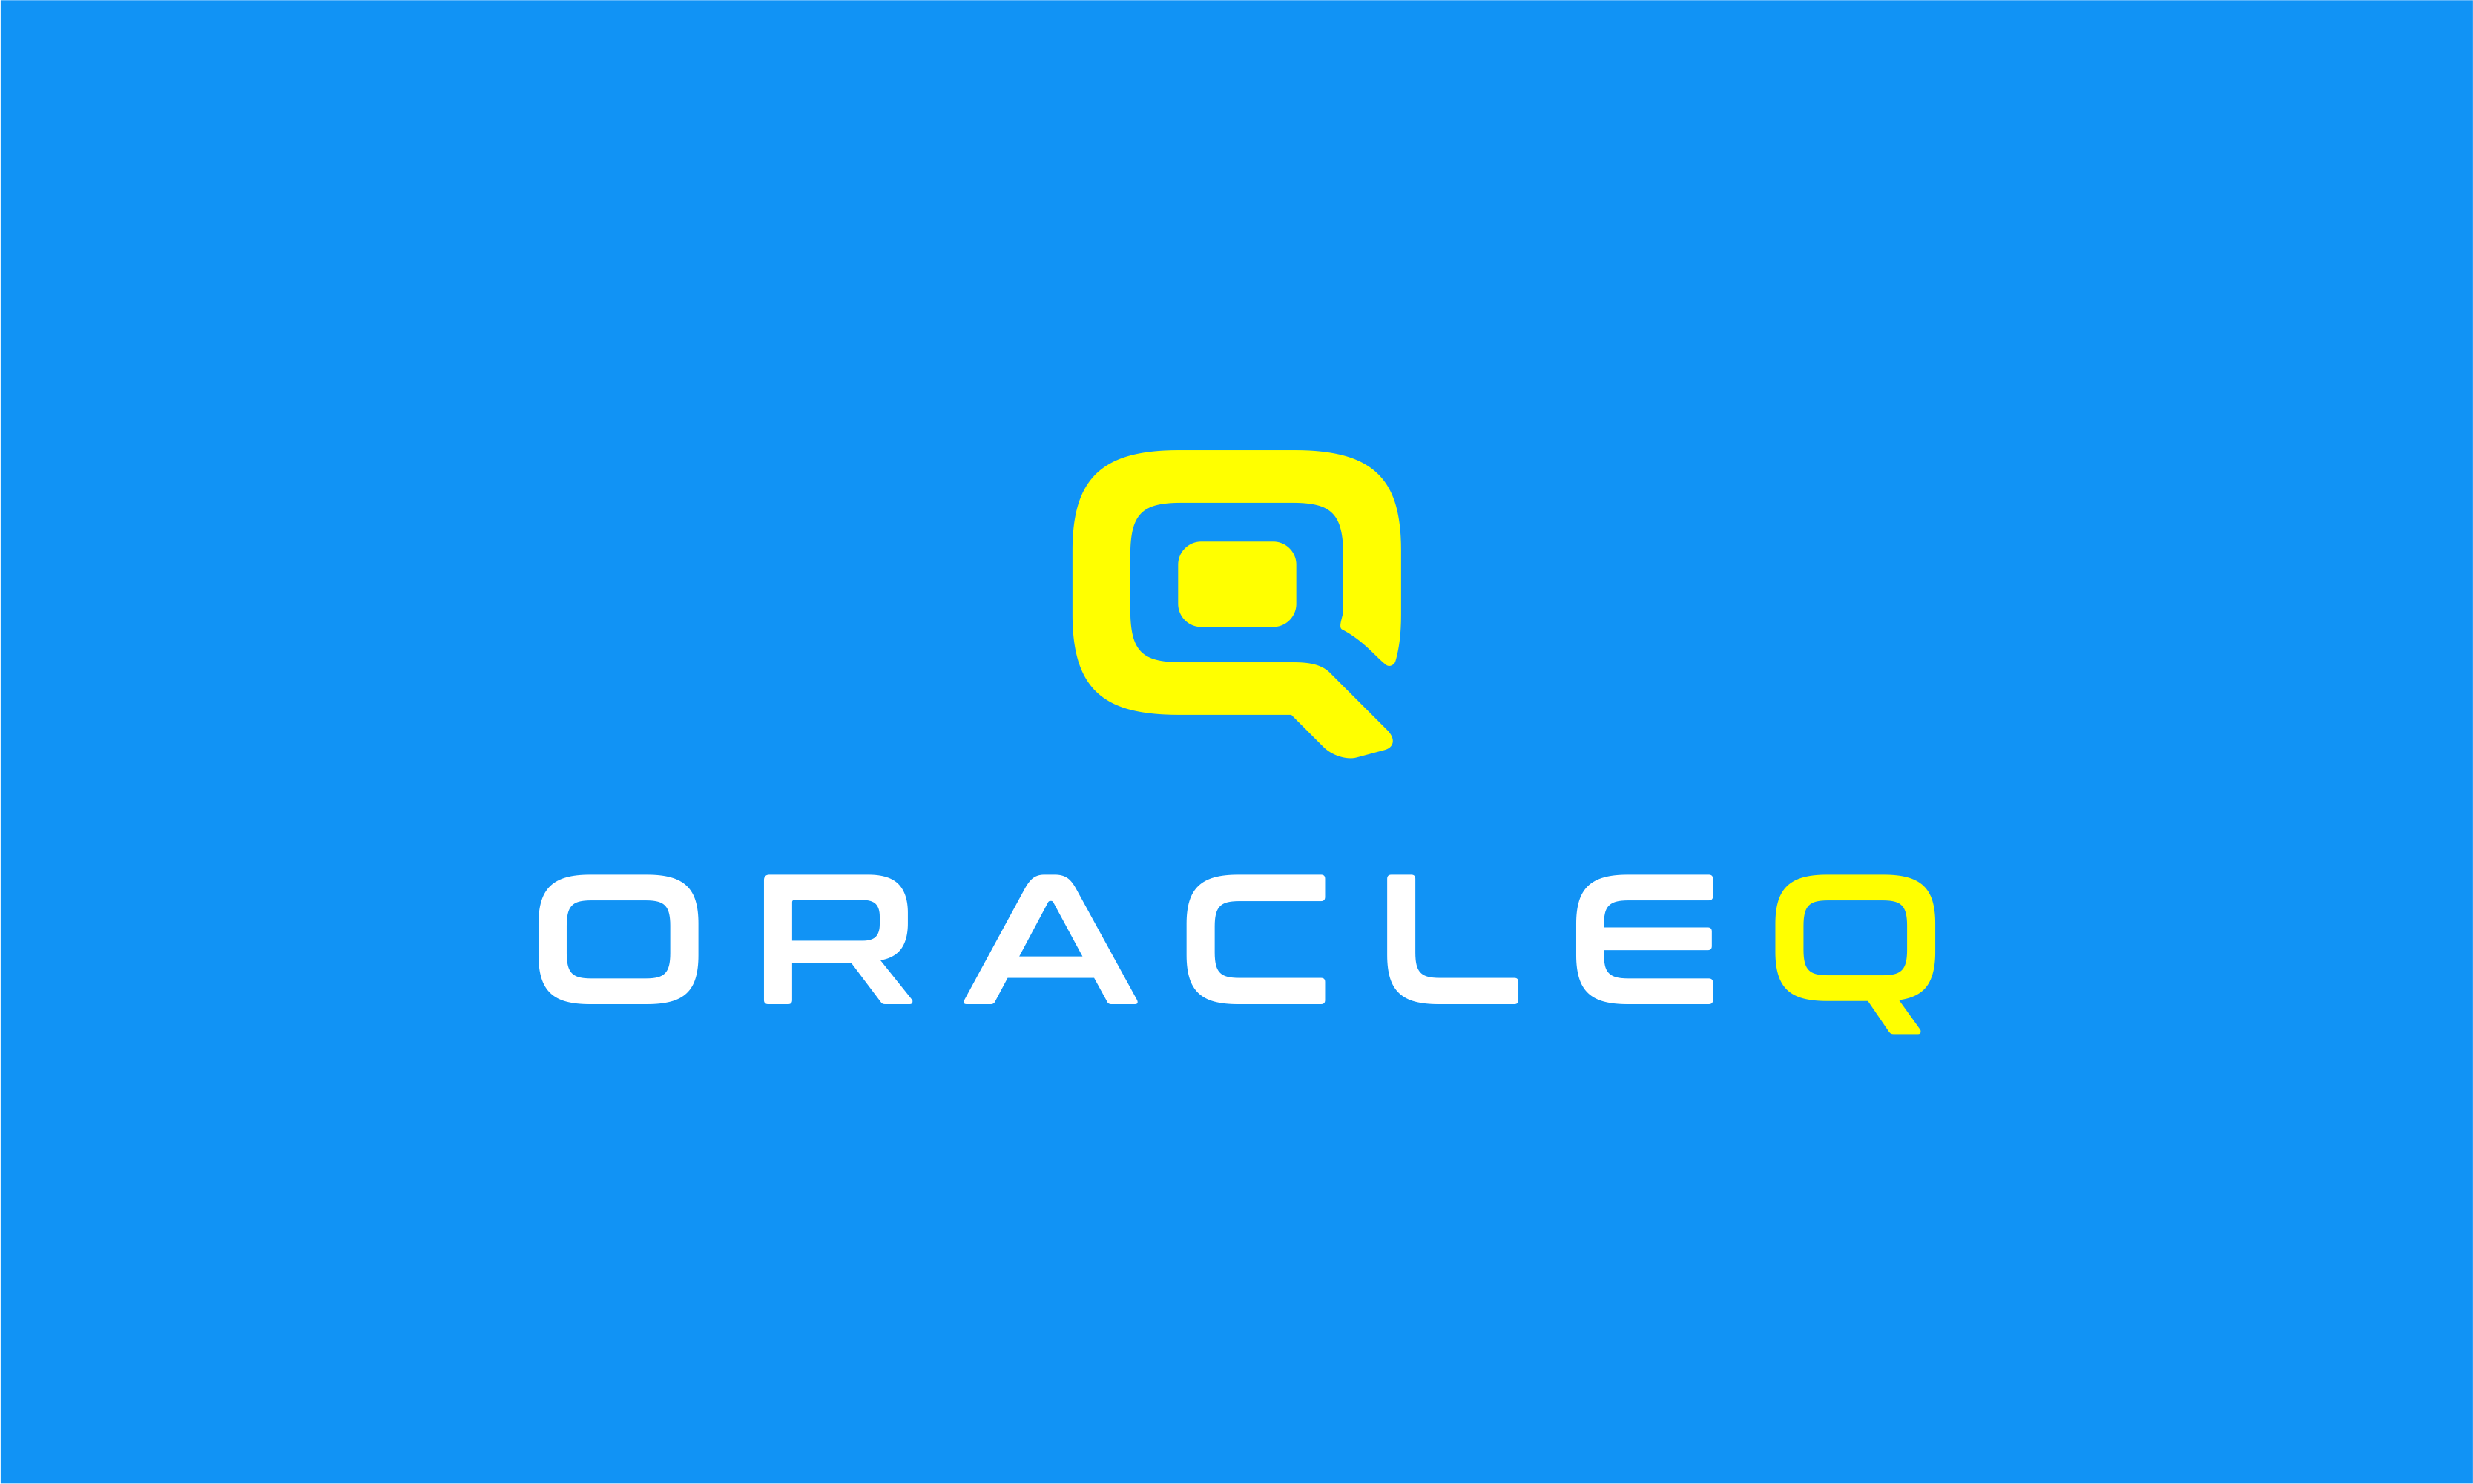 Oracleq